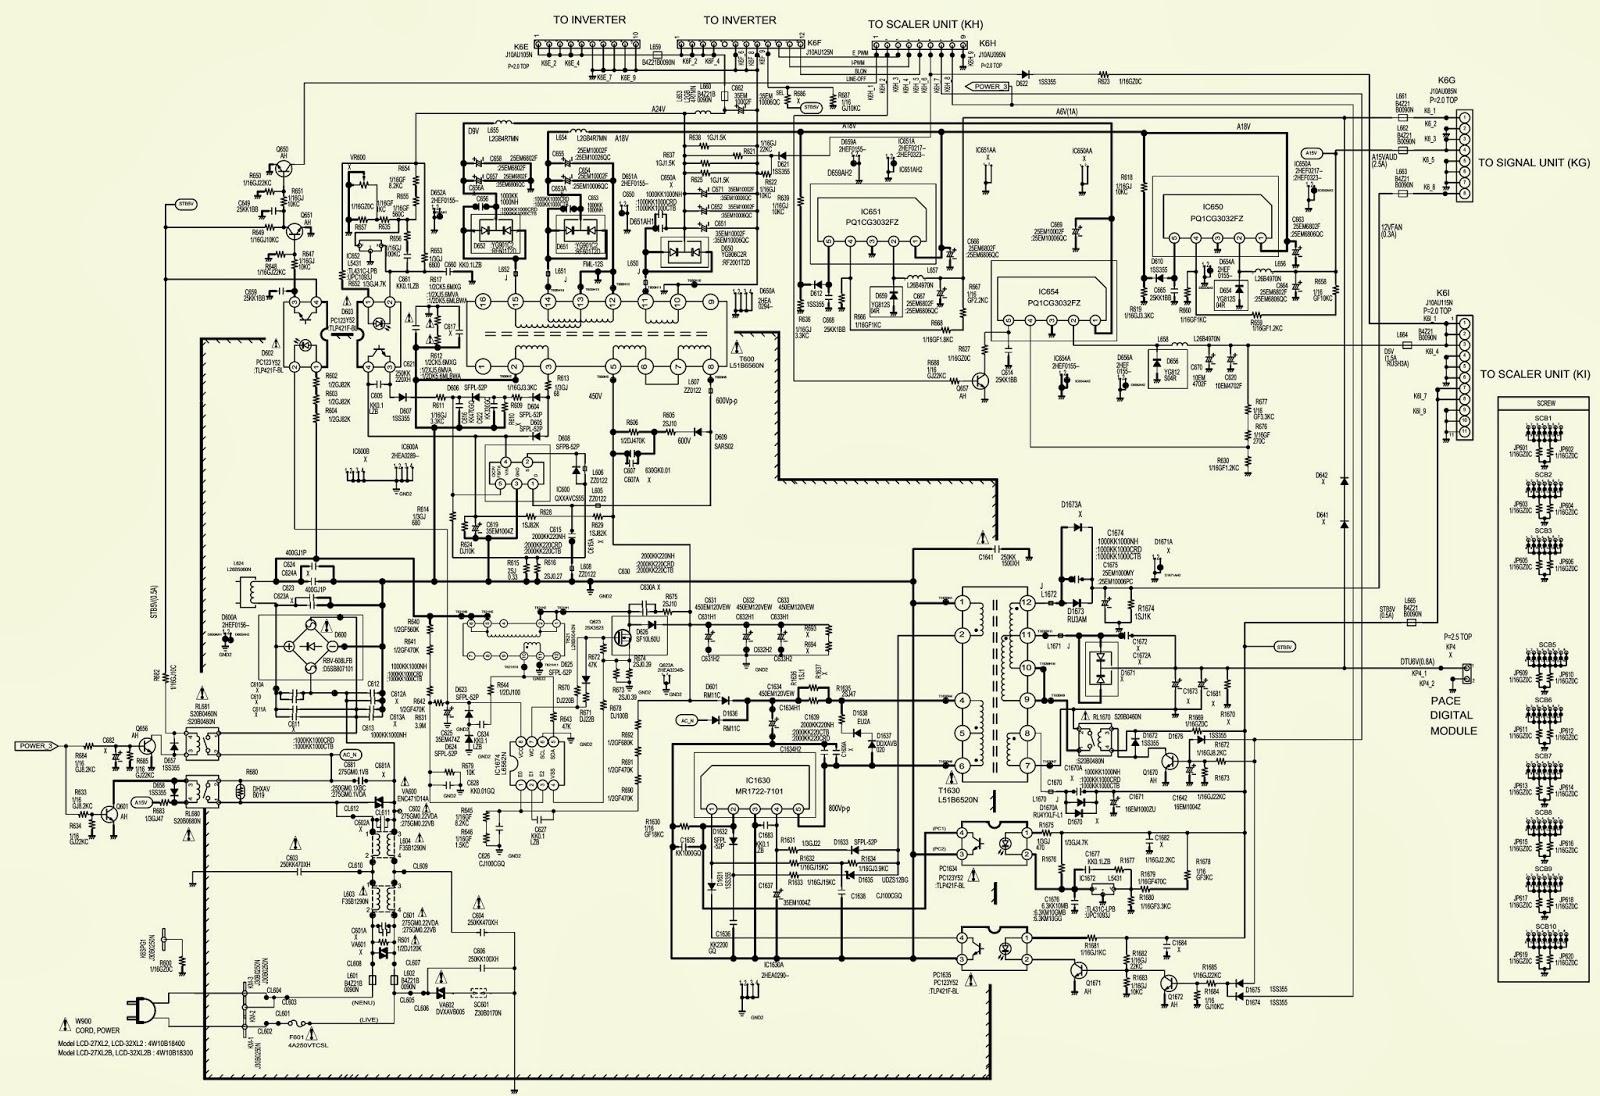 sanyo lcd-27xl2 – lcd32xl2 - power supply schematic ... sanyo schematic diagram